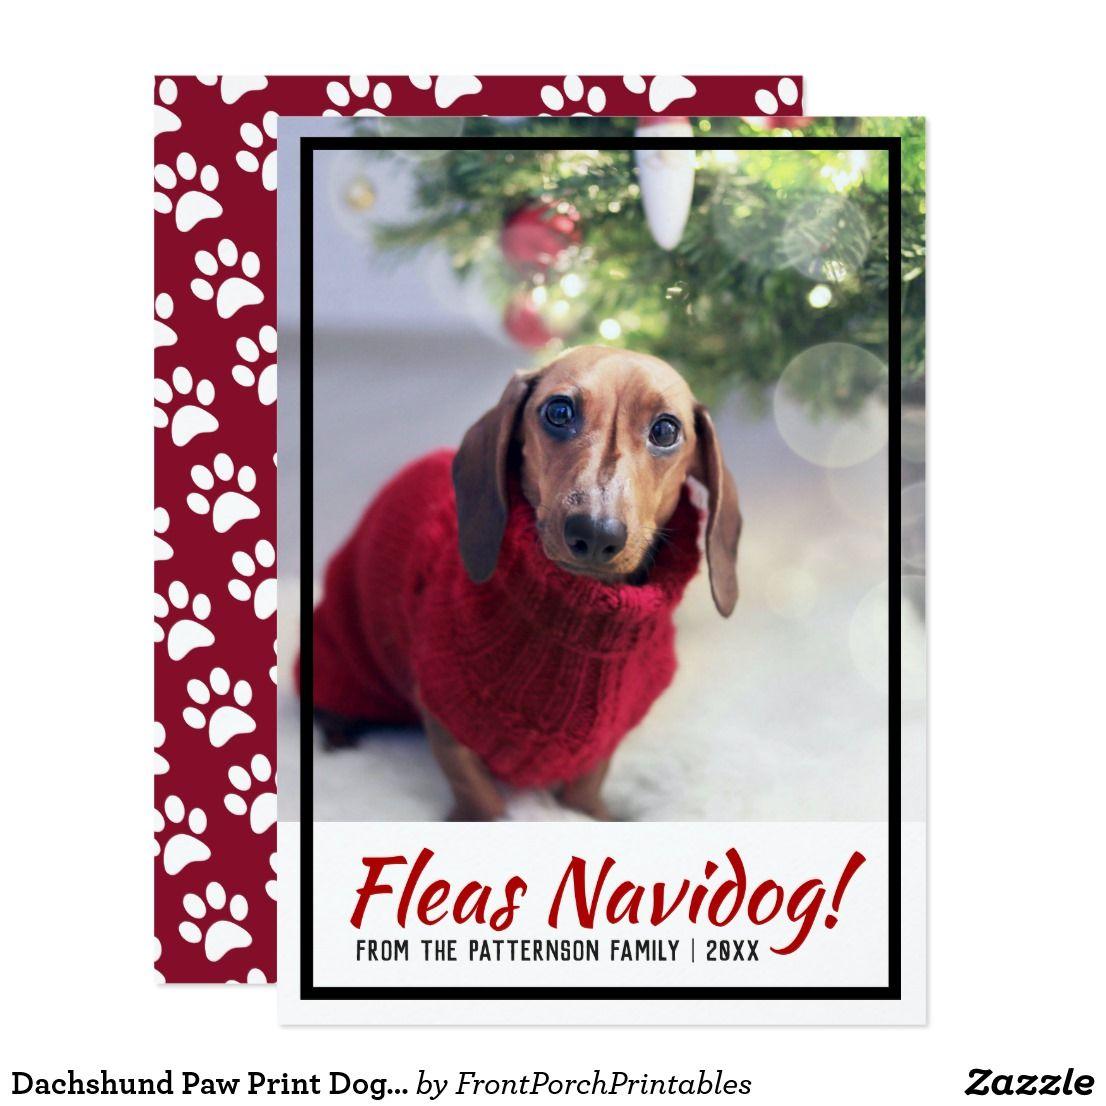 Dachshund Dog Photo Paw Print Christmas